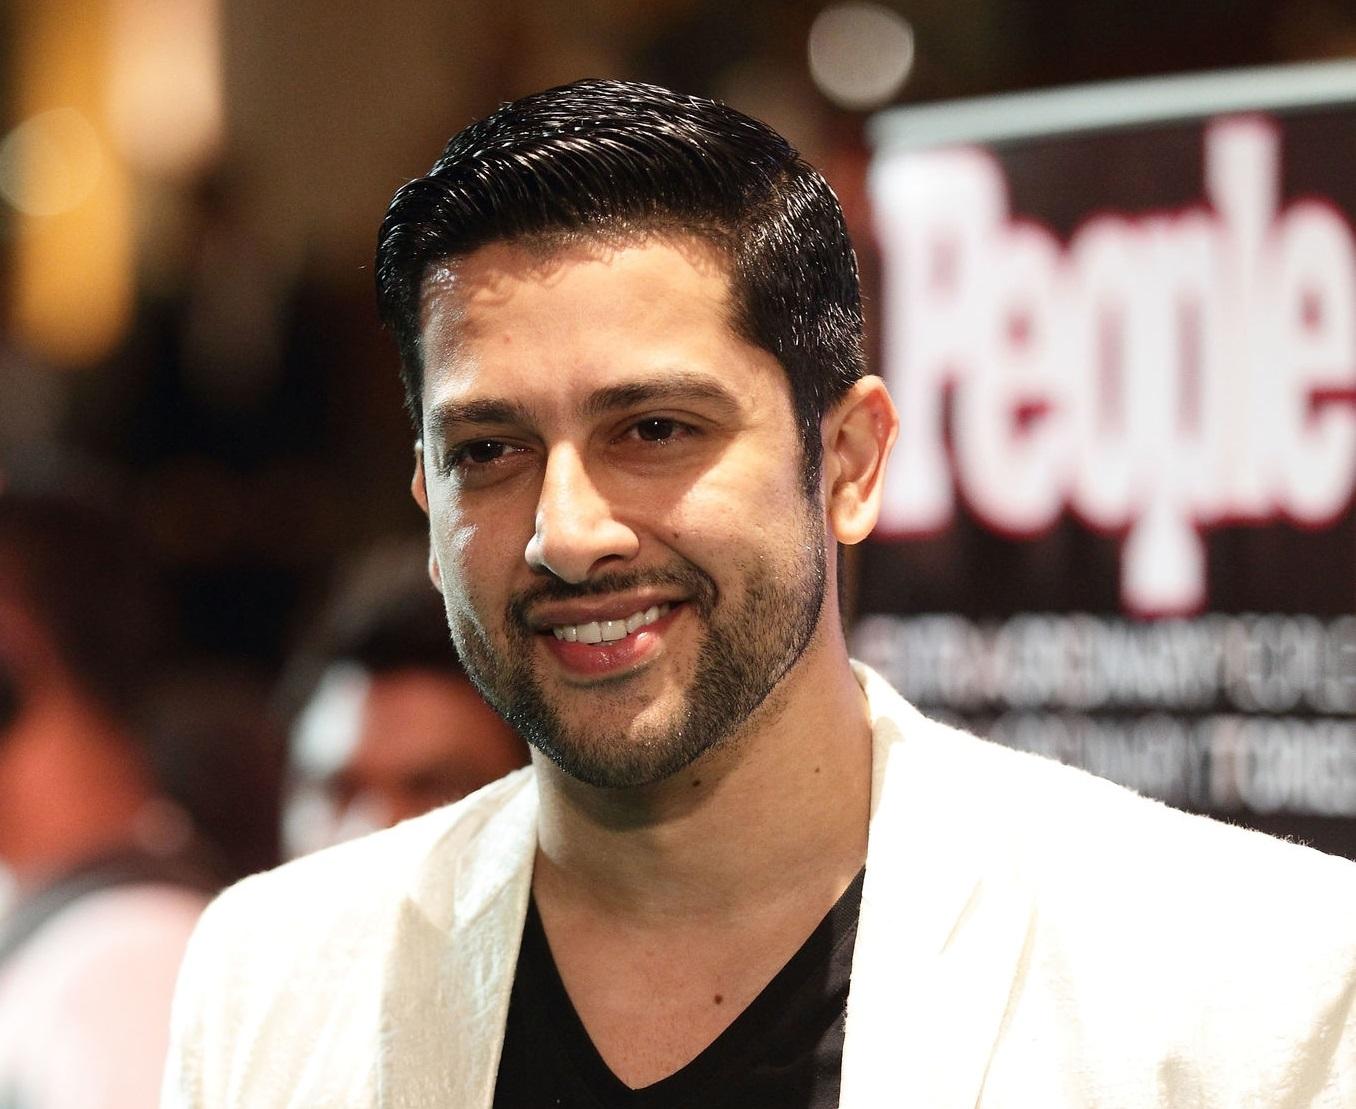 Aftab Shivdasani (Photo by Suhaimi Abdullah/Getty Images)